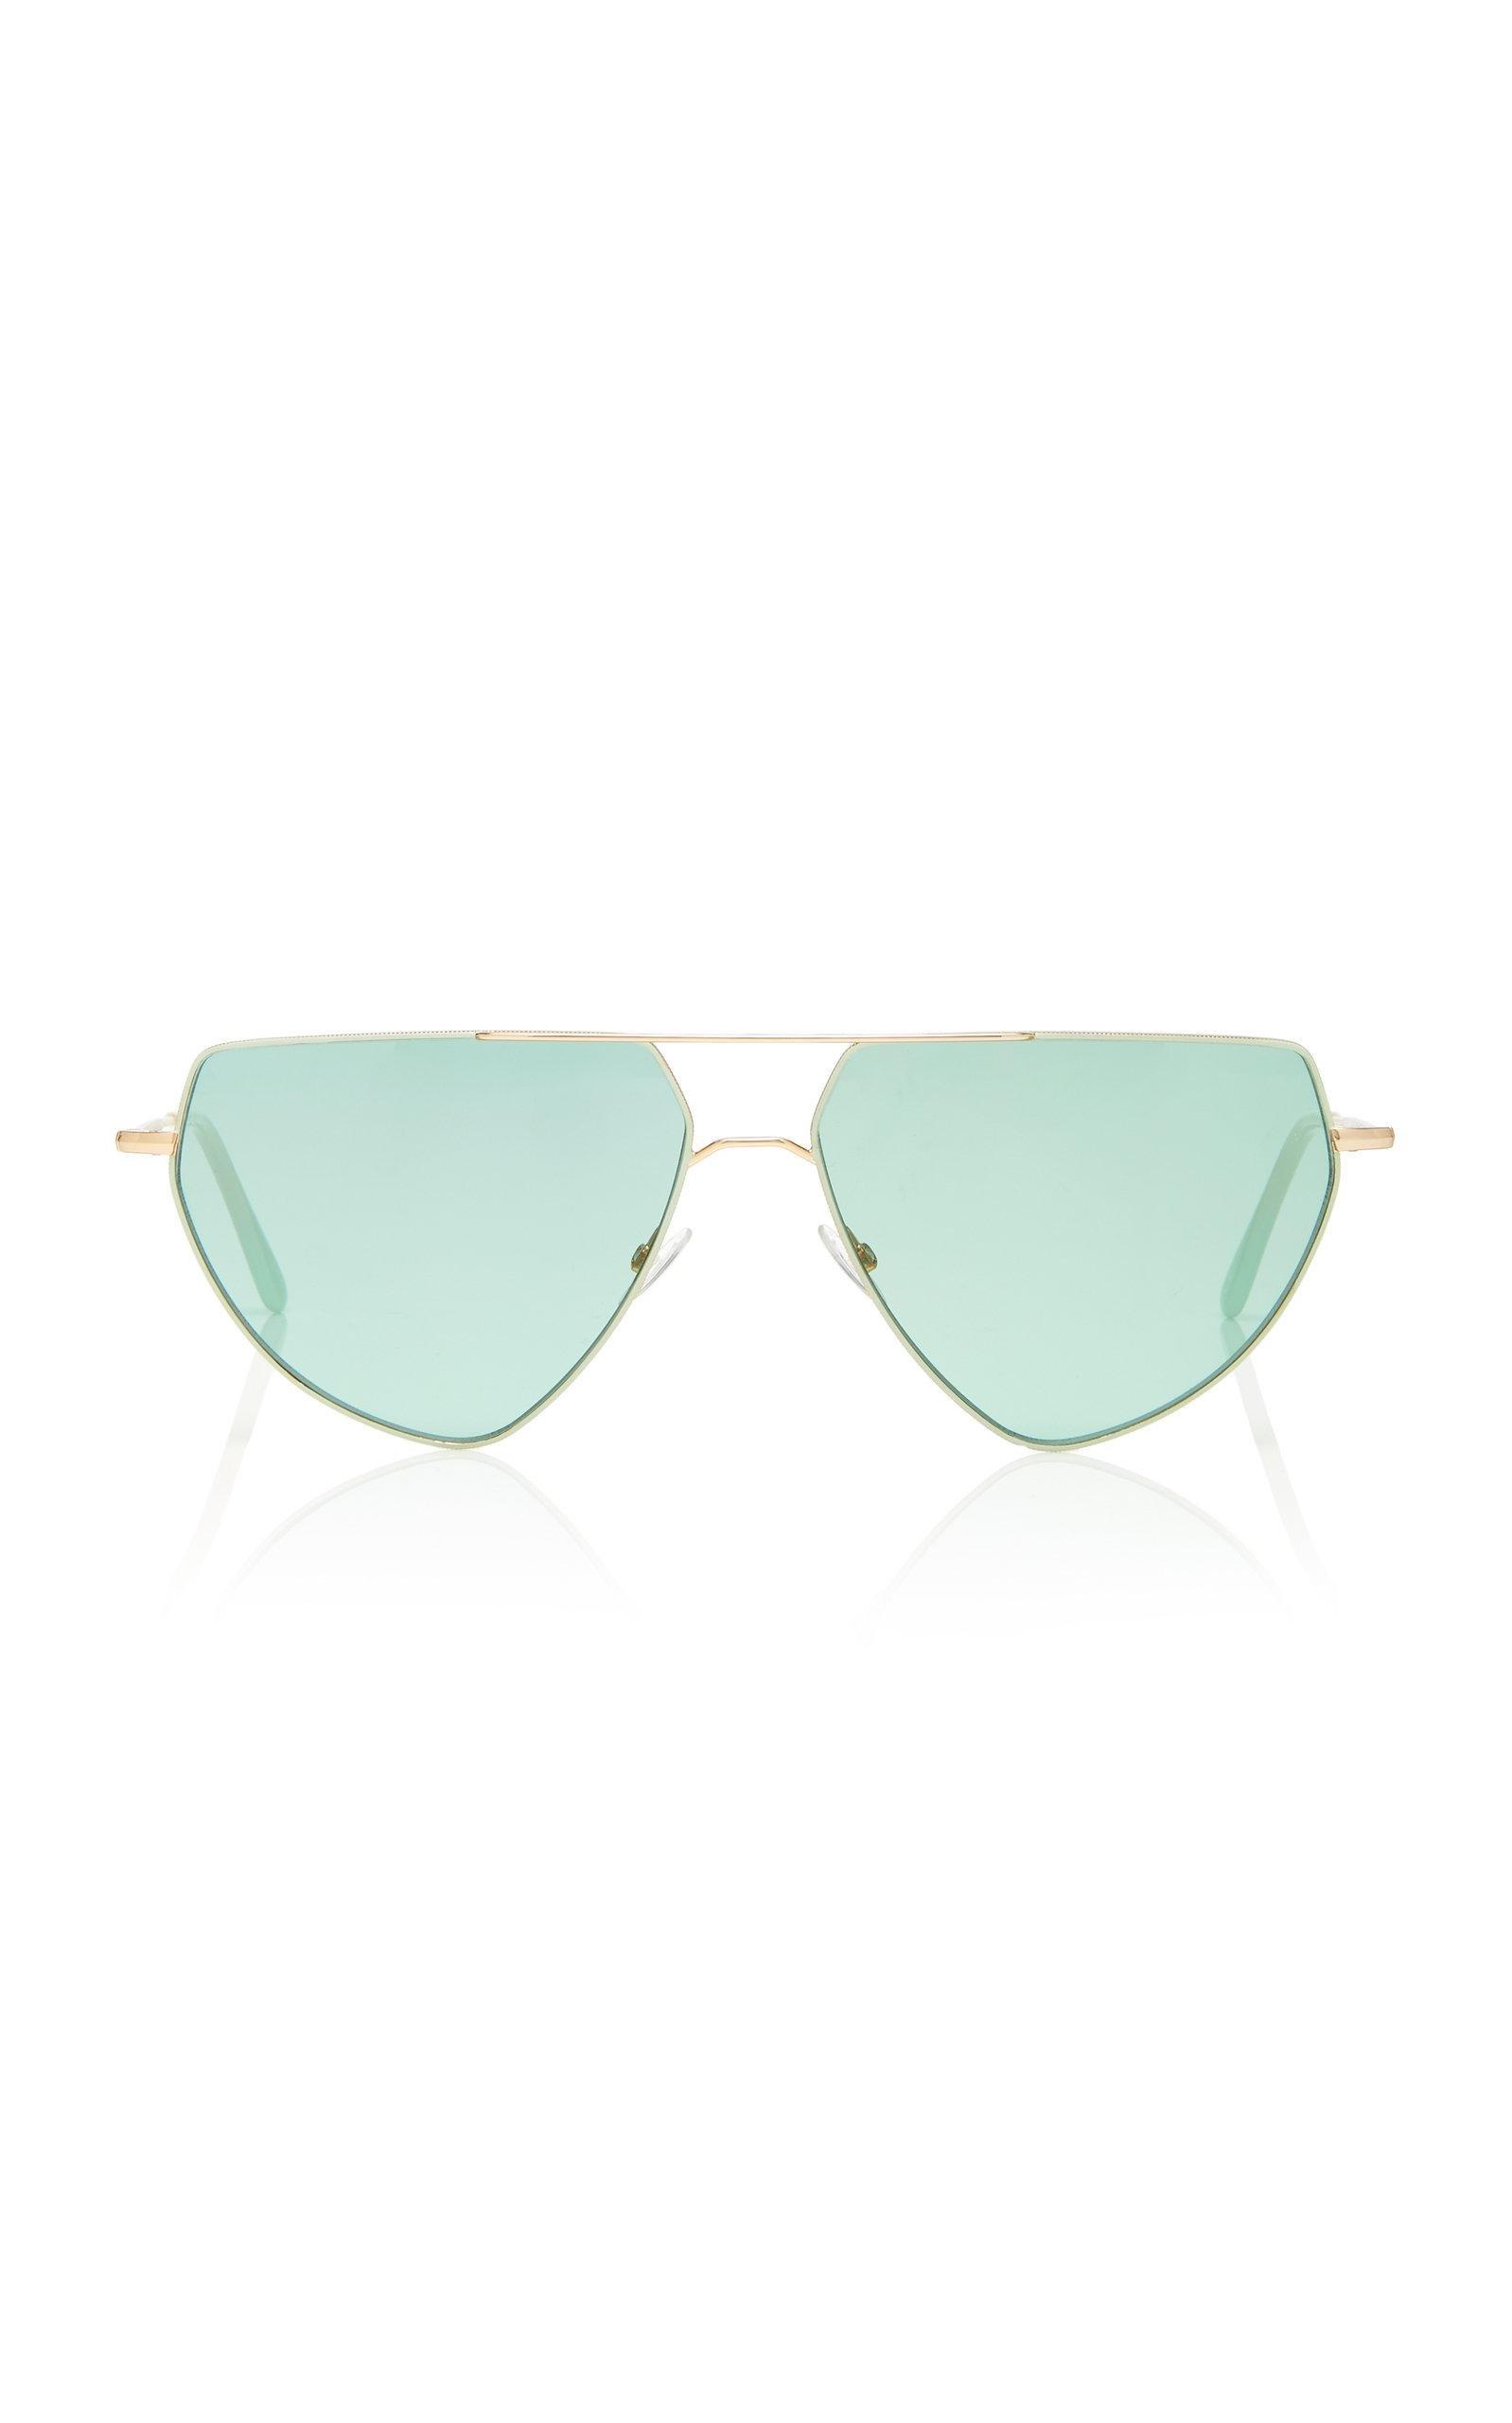 Andy Wolf Sonnenbrille Drax w8M4bM